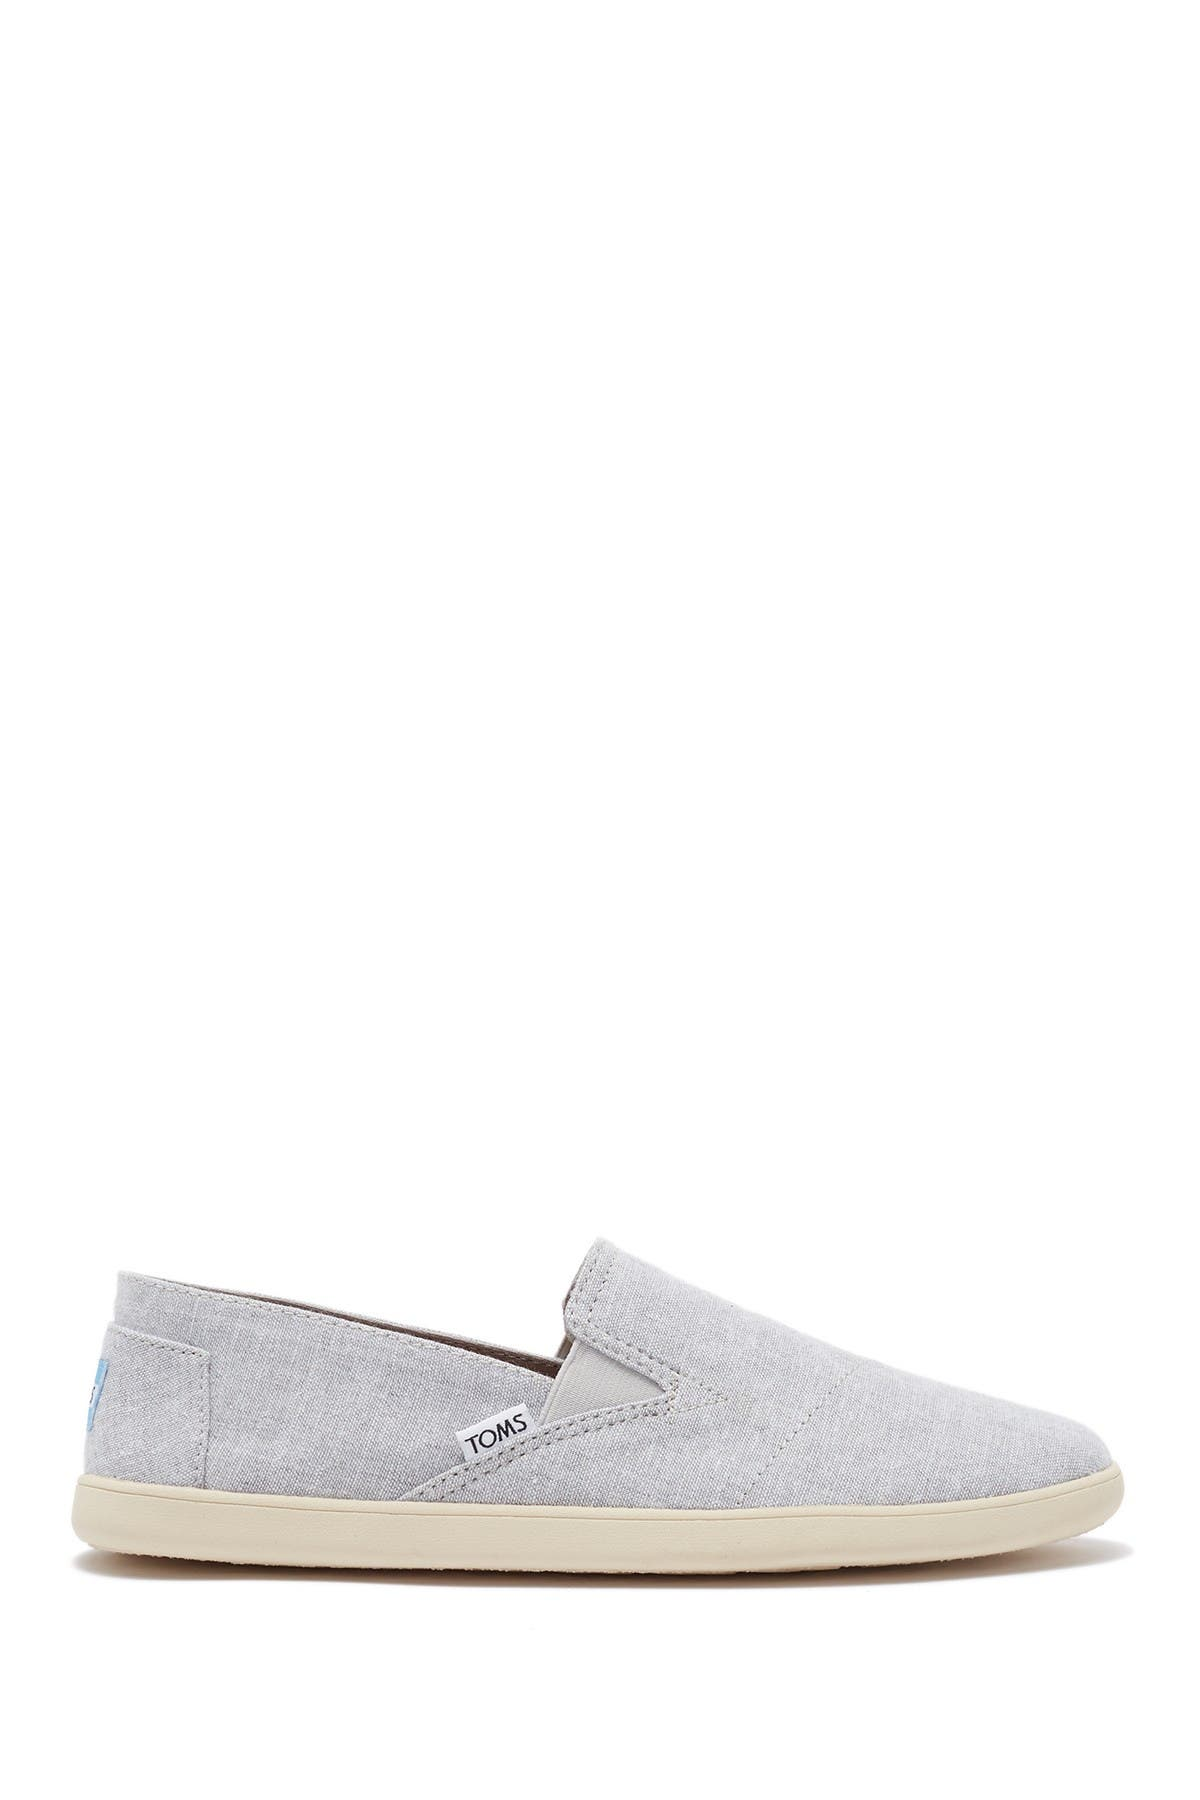 TOMS | Pico Canvas Sneaker | HauteLook